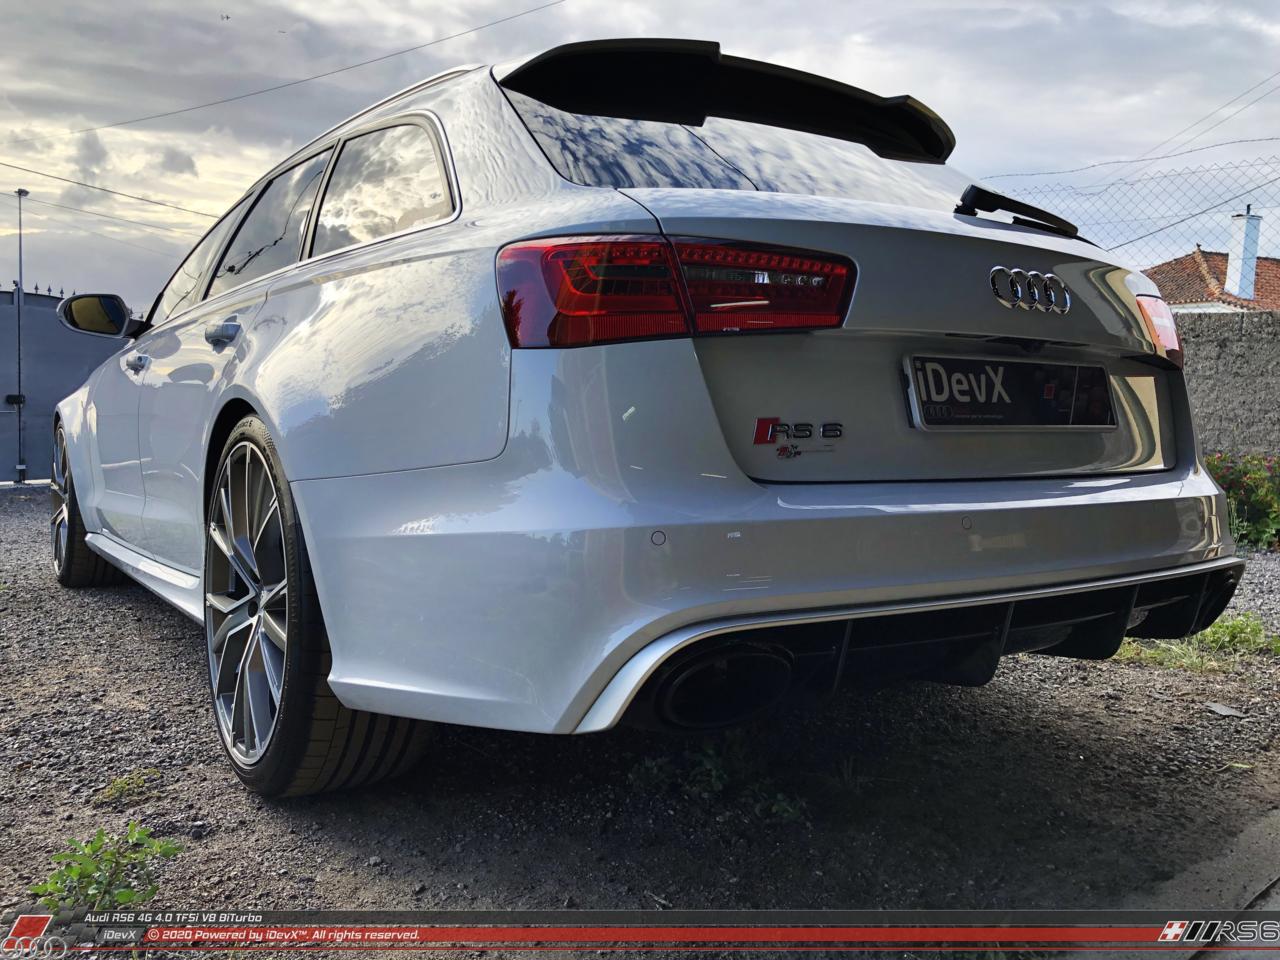 05_08.2019_Audi-RS6_iDevX_045.png